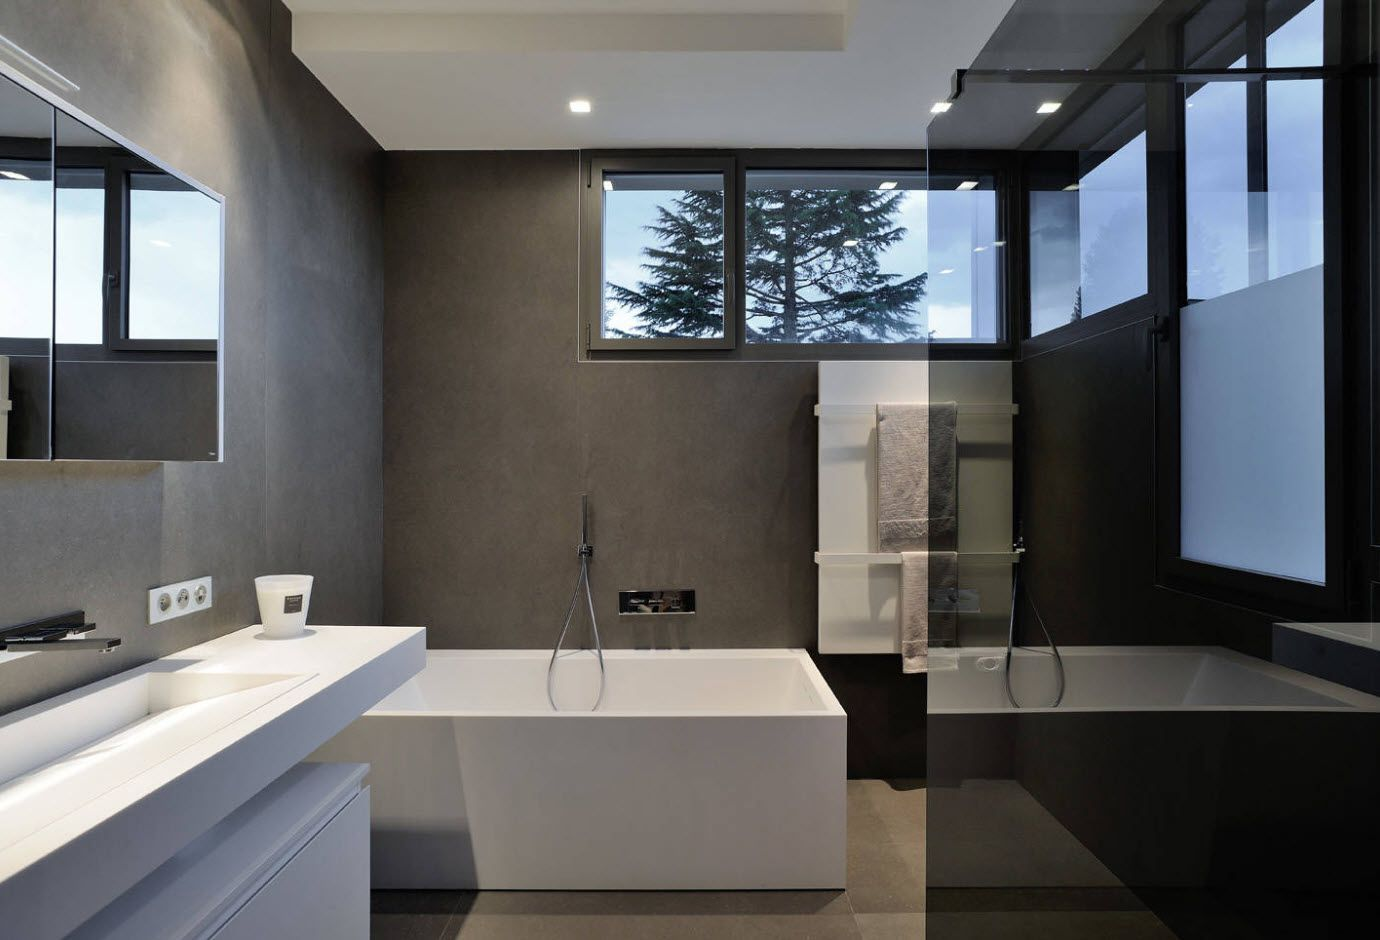 Dark gray and white accent in the futuristic strict lined design 2017